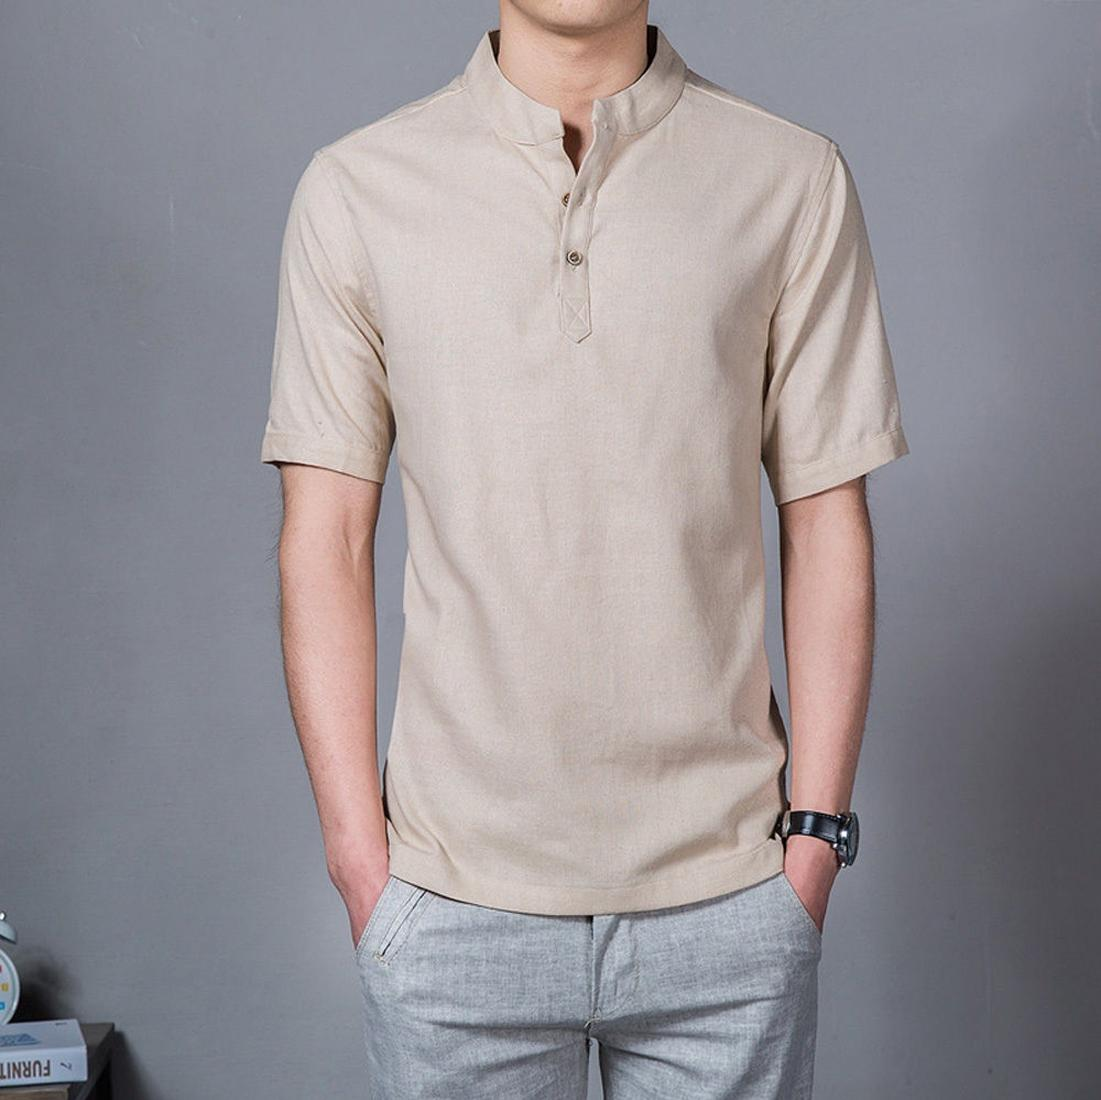 Baju koko Lazuardi Ternama Tangan Pendek Warna Cream Distro Bandung Fashion Pria Keren Terbaru Nyaman di Pakai Simple Eleghan Tersedia 8 warna DISKON